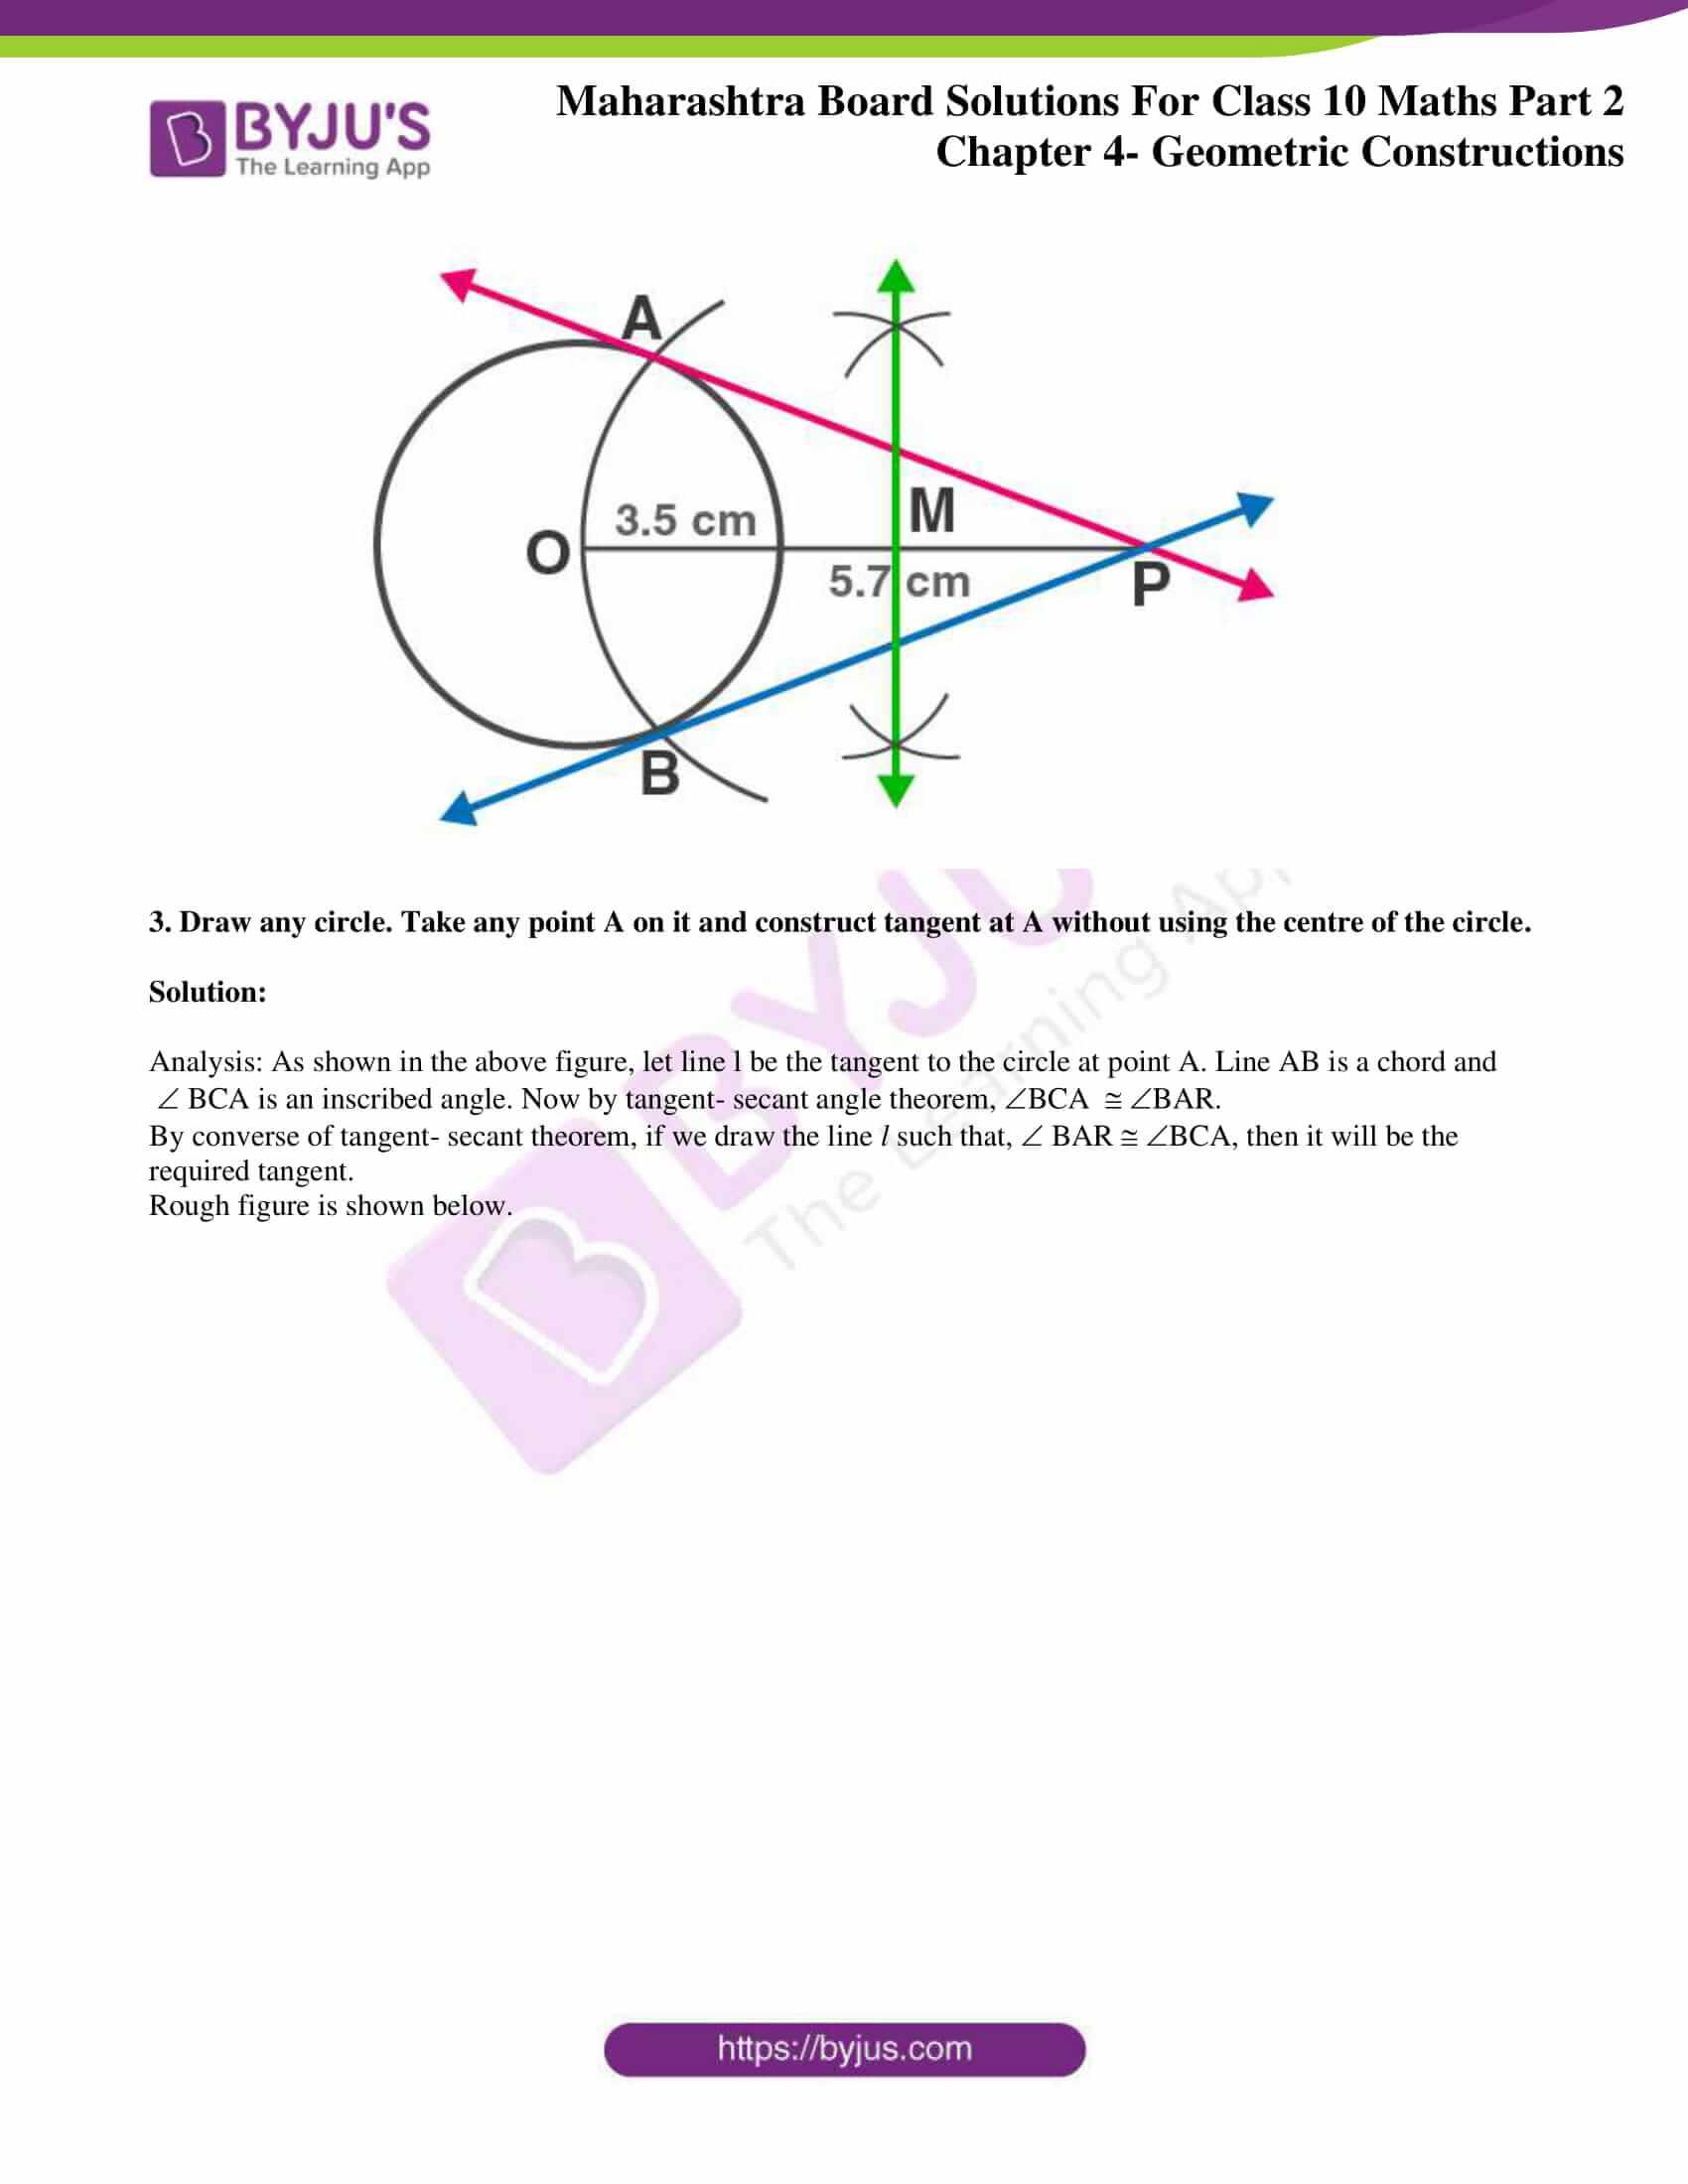 msbshse sol class 10 maths part 2 chapter 4 11